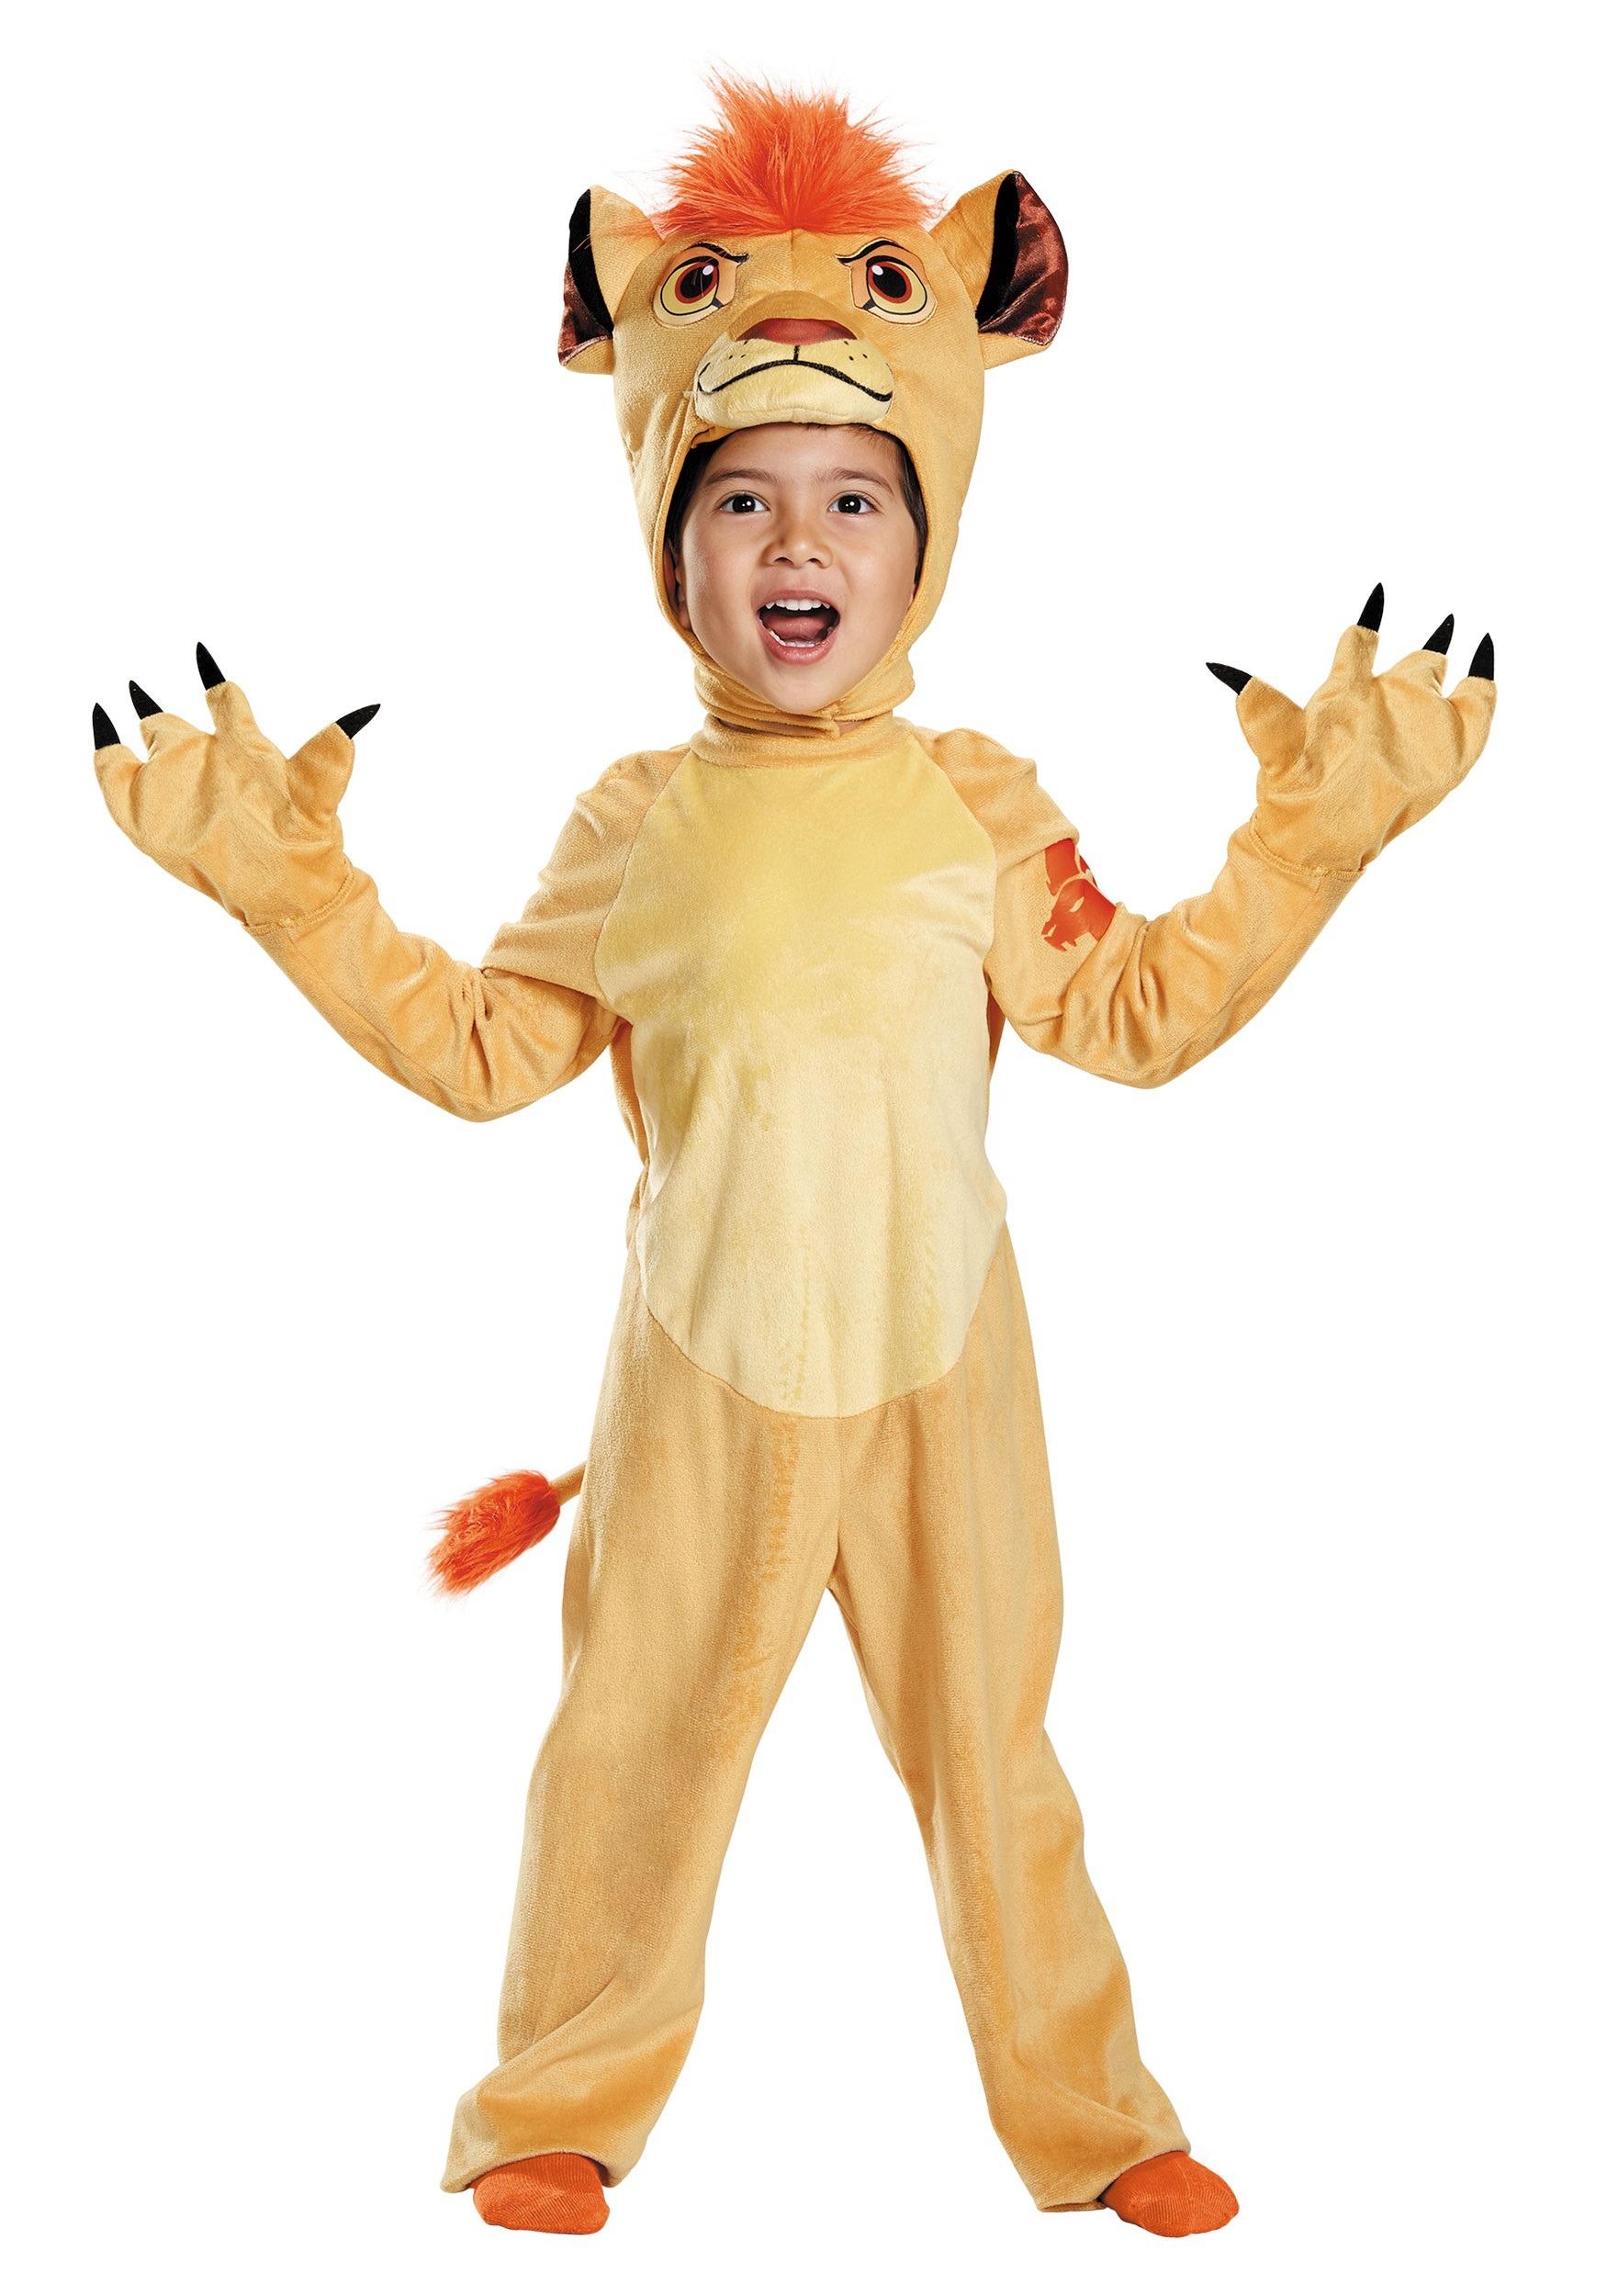 Toddler Deluxe Lion Guard Kion Costume  sc 1 st  Fun.com & Deluxe Lion Guard Kion Toddler Costume